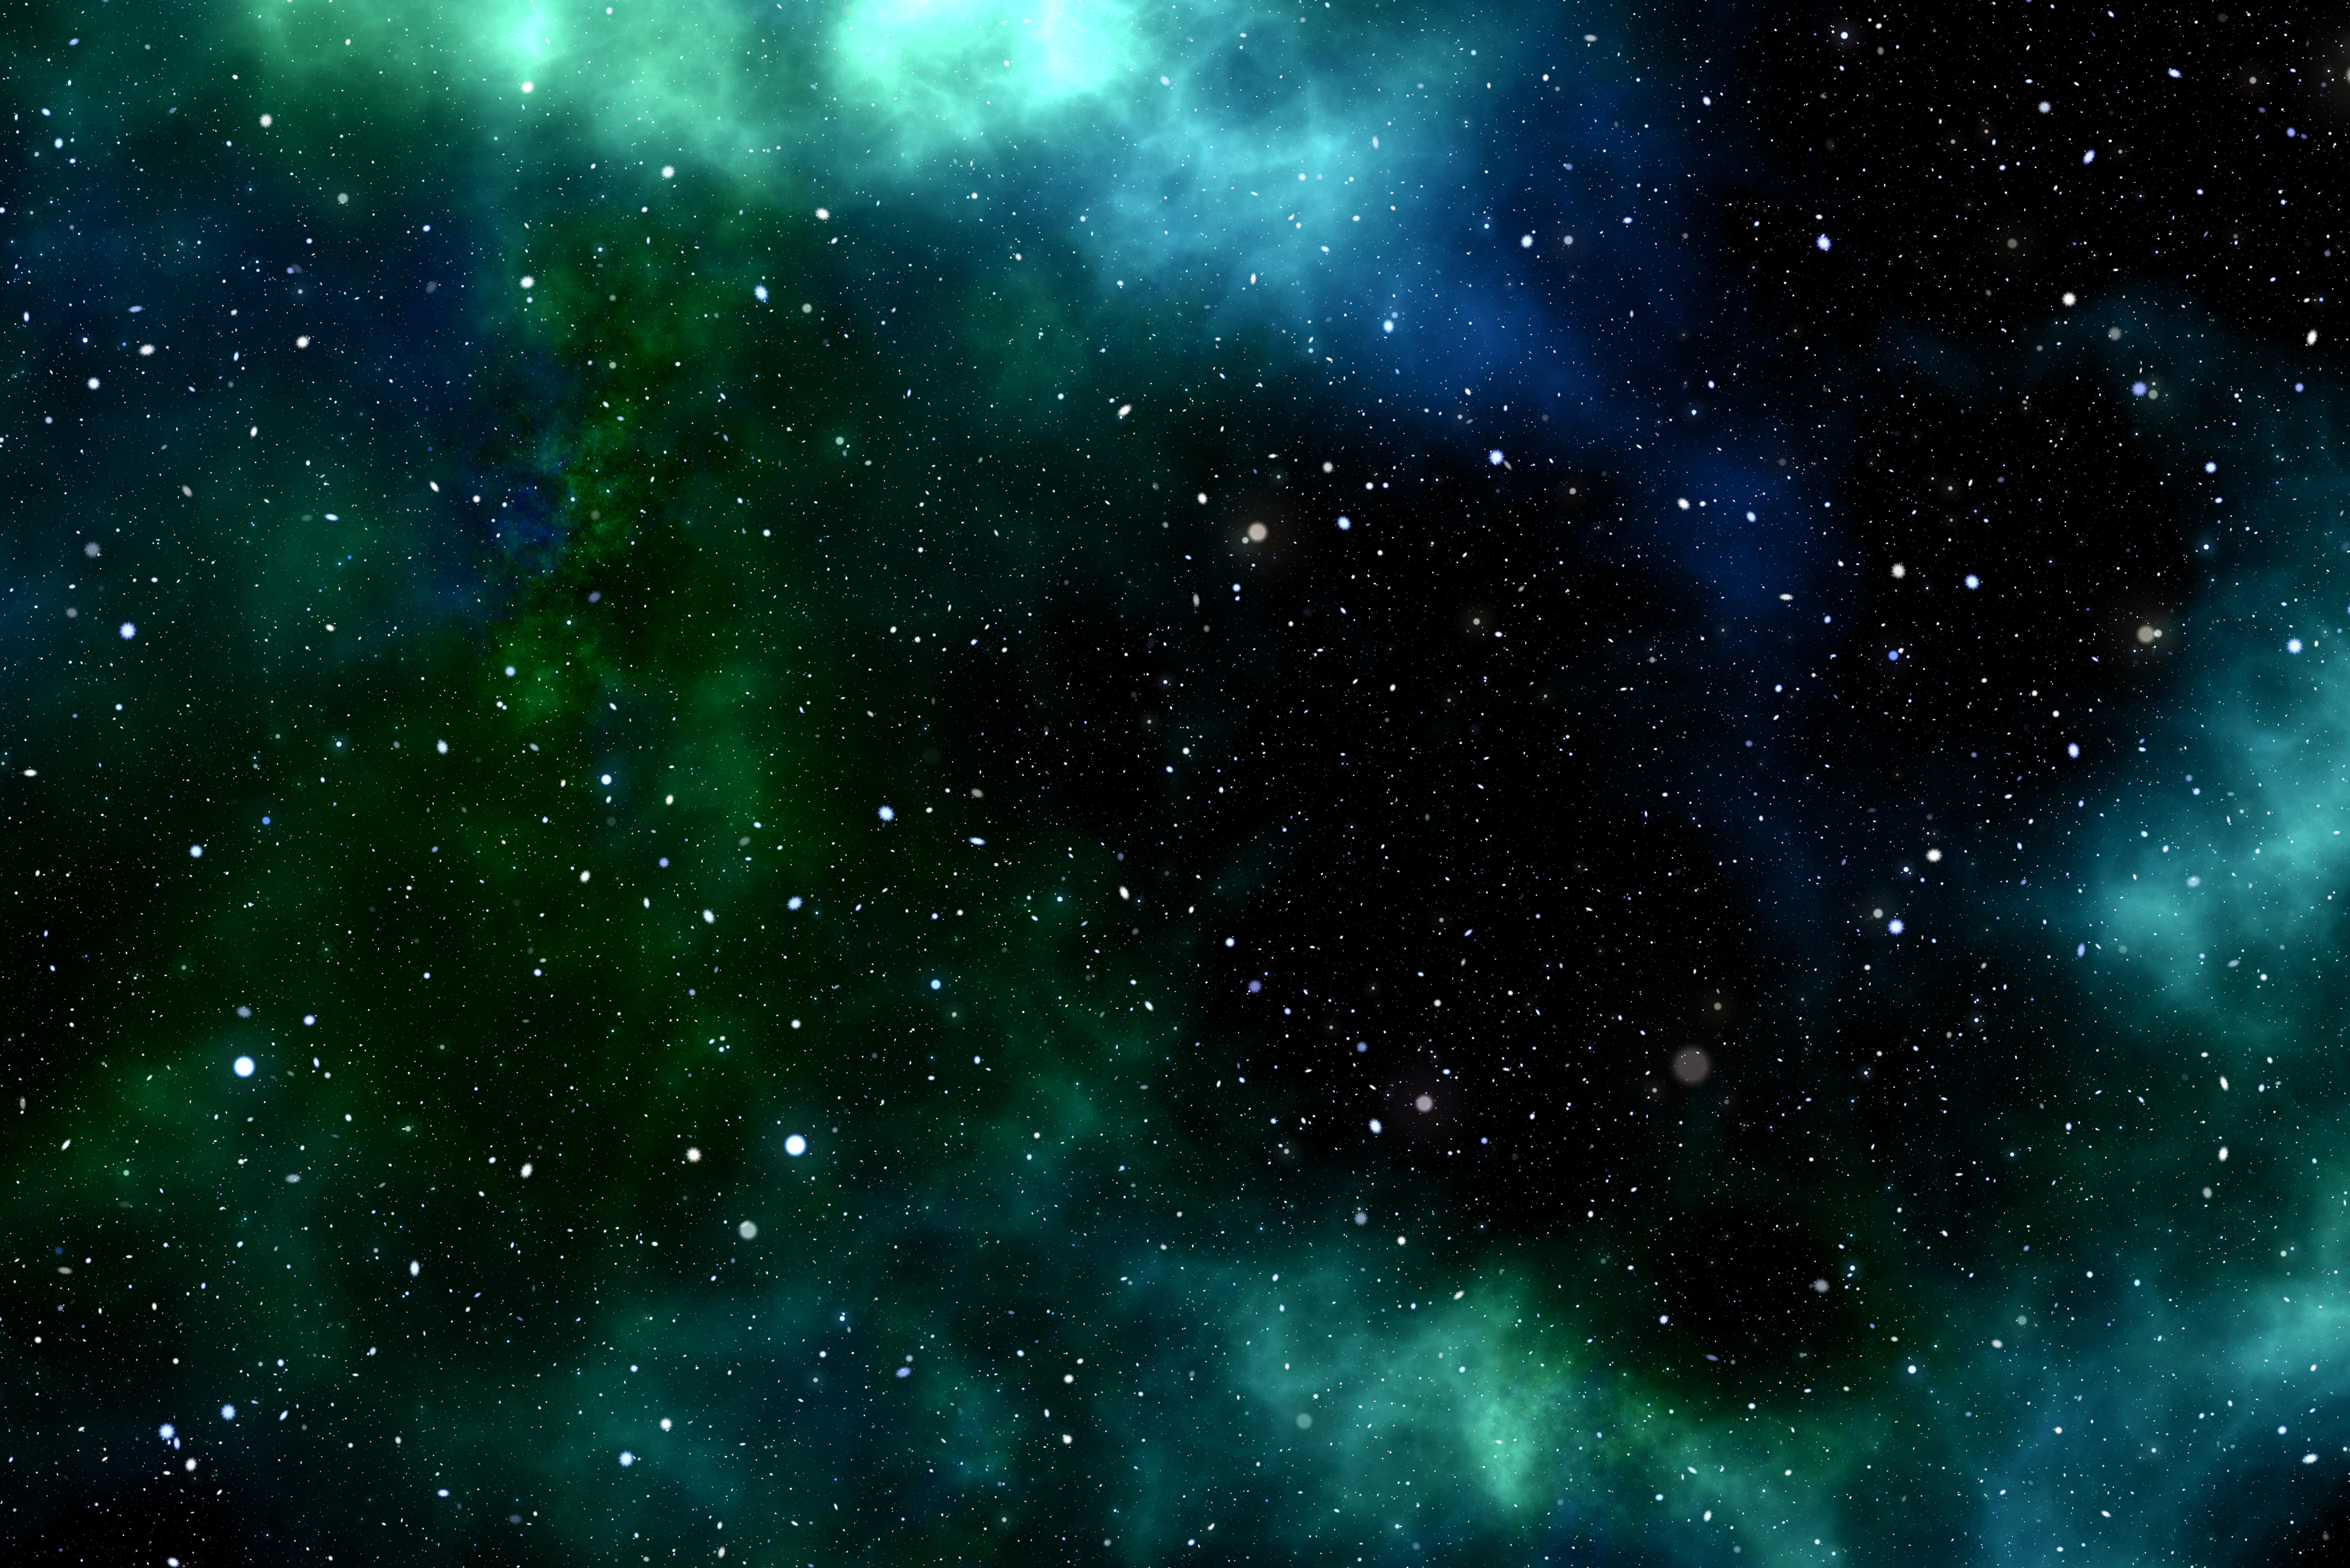 Green Galaxy 6K UHD Wallpaper